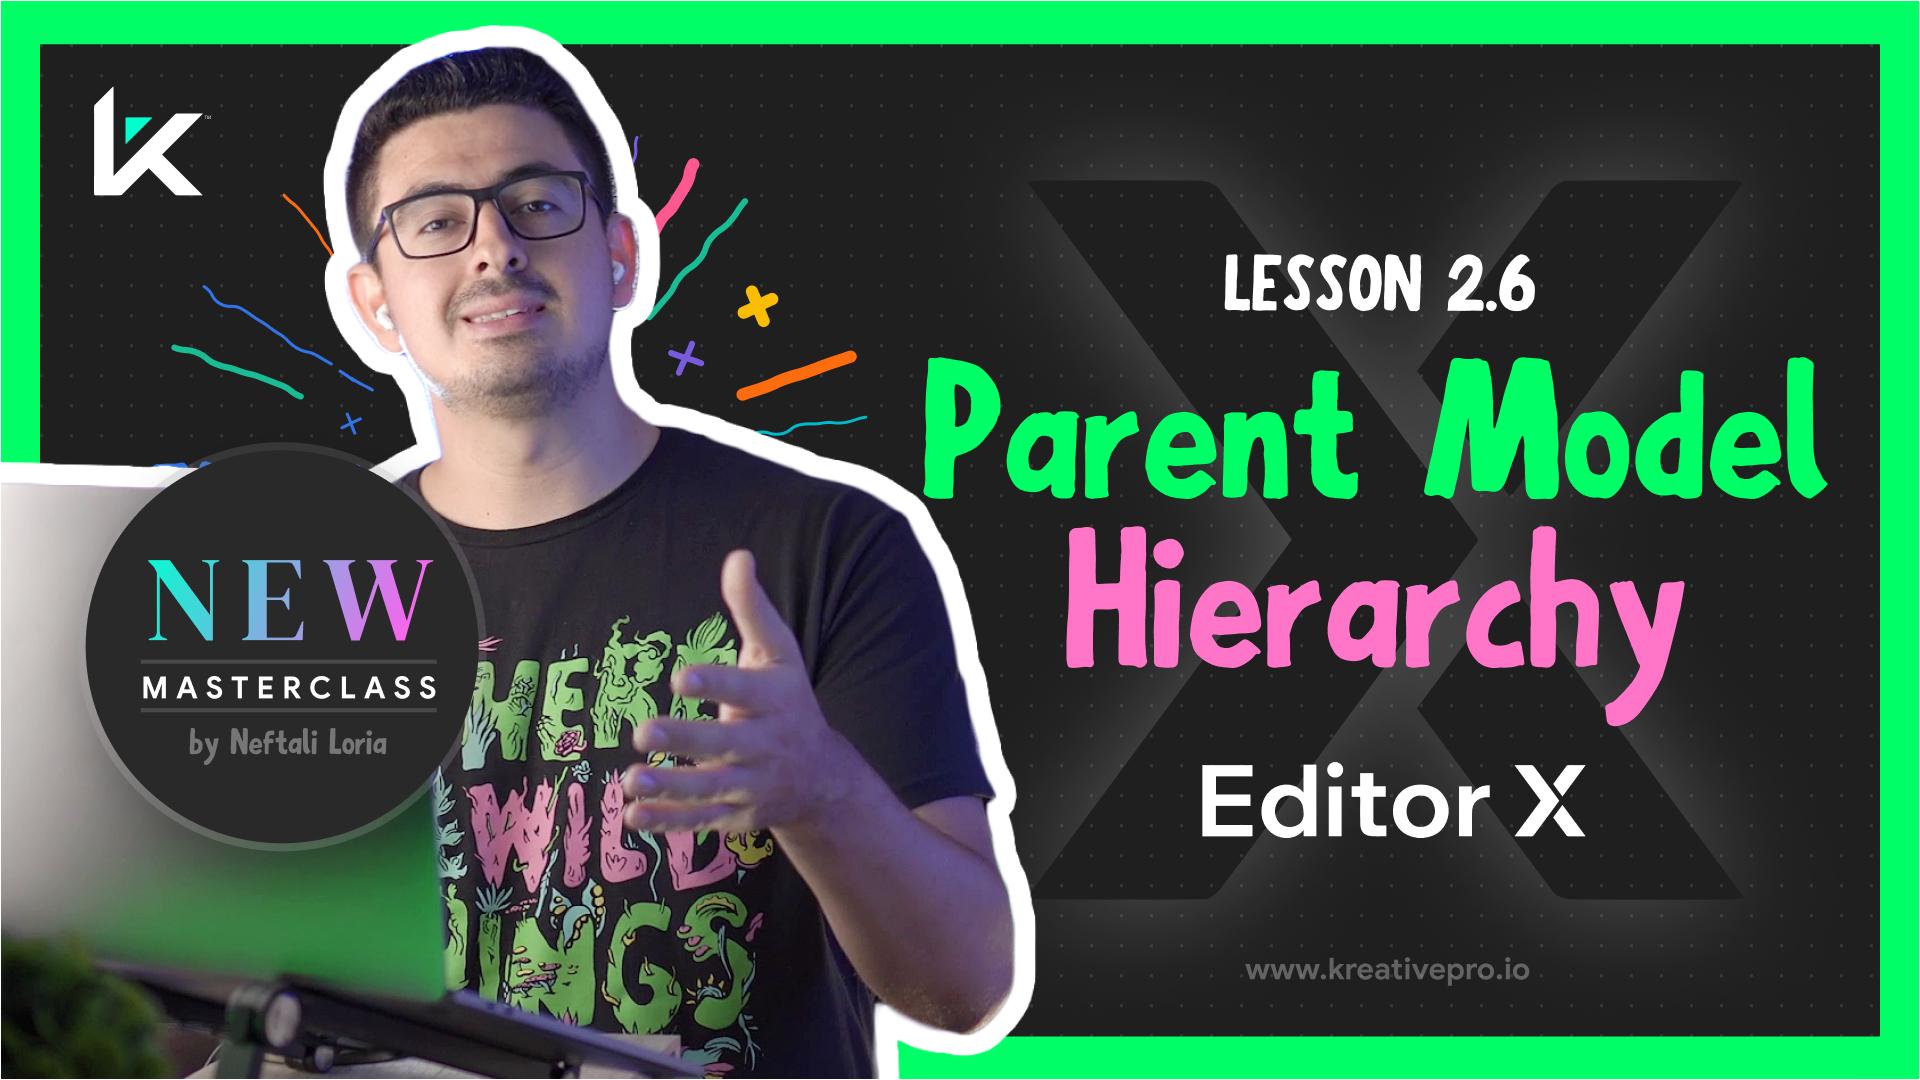 Editor X 2.6 - Editor X Parent Model Hierarchy